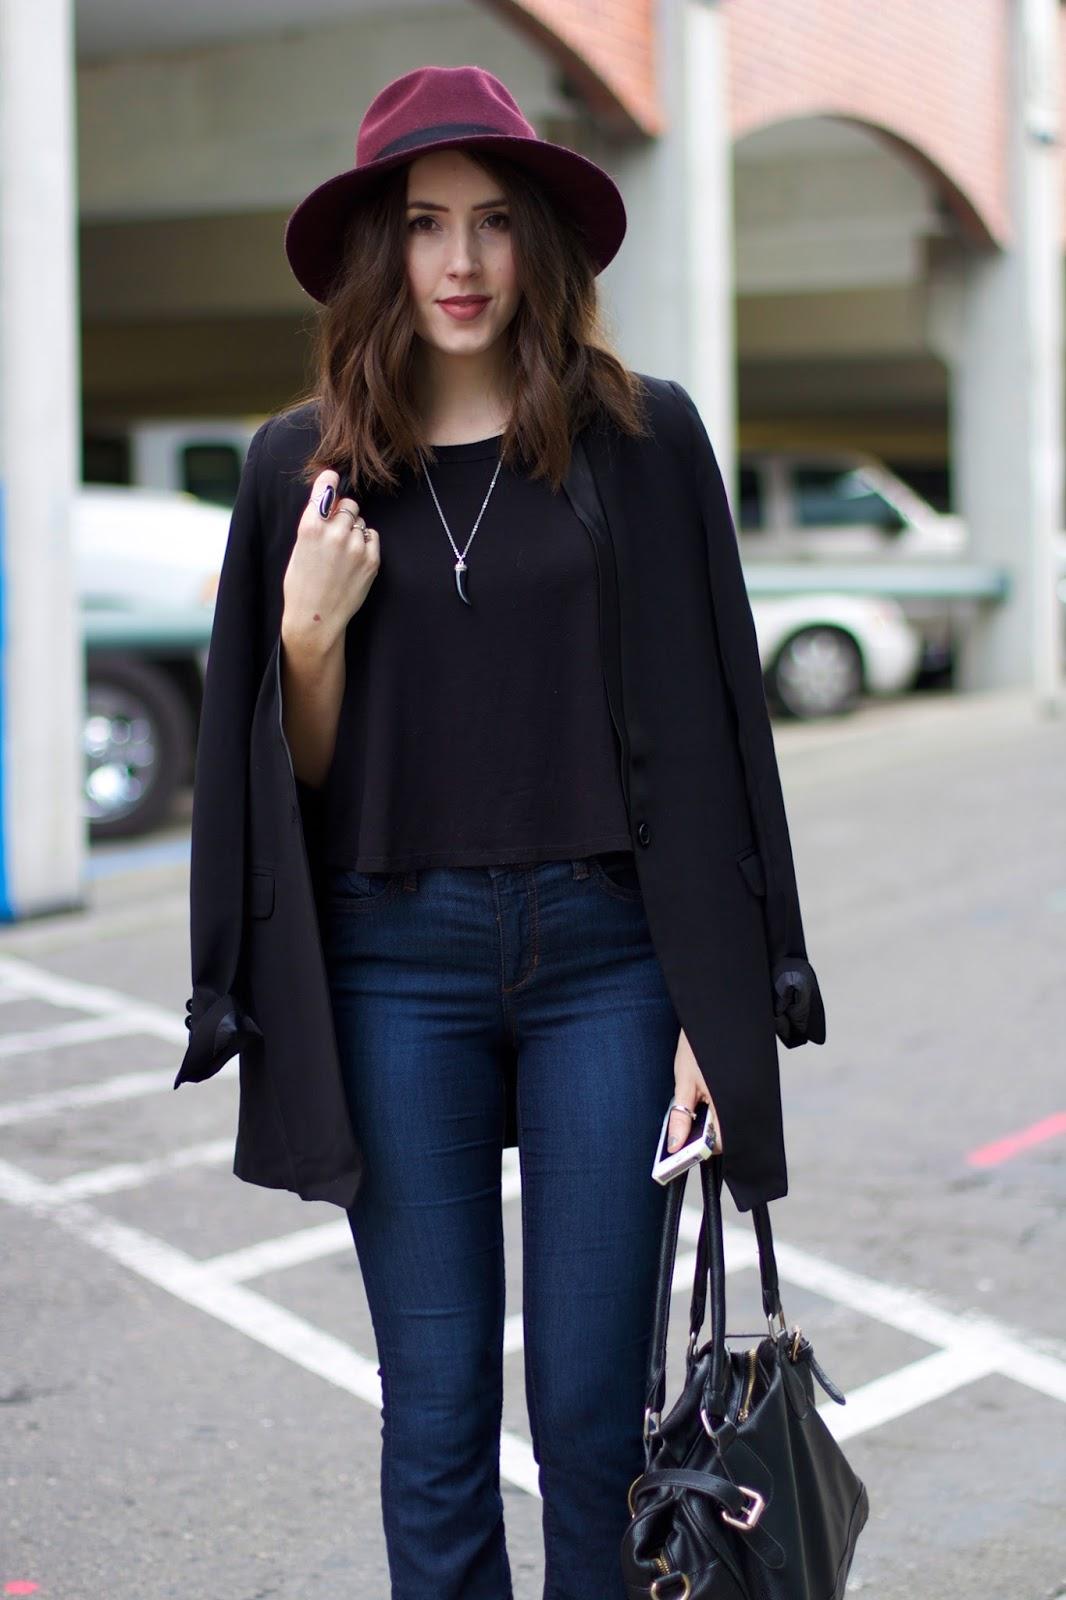 black-blazer-outfit